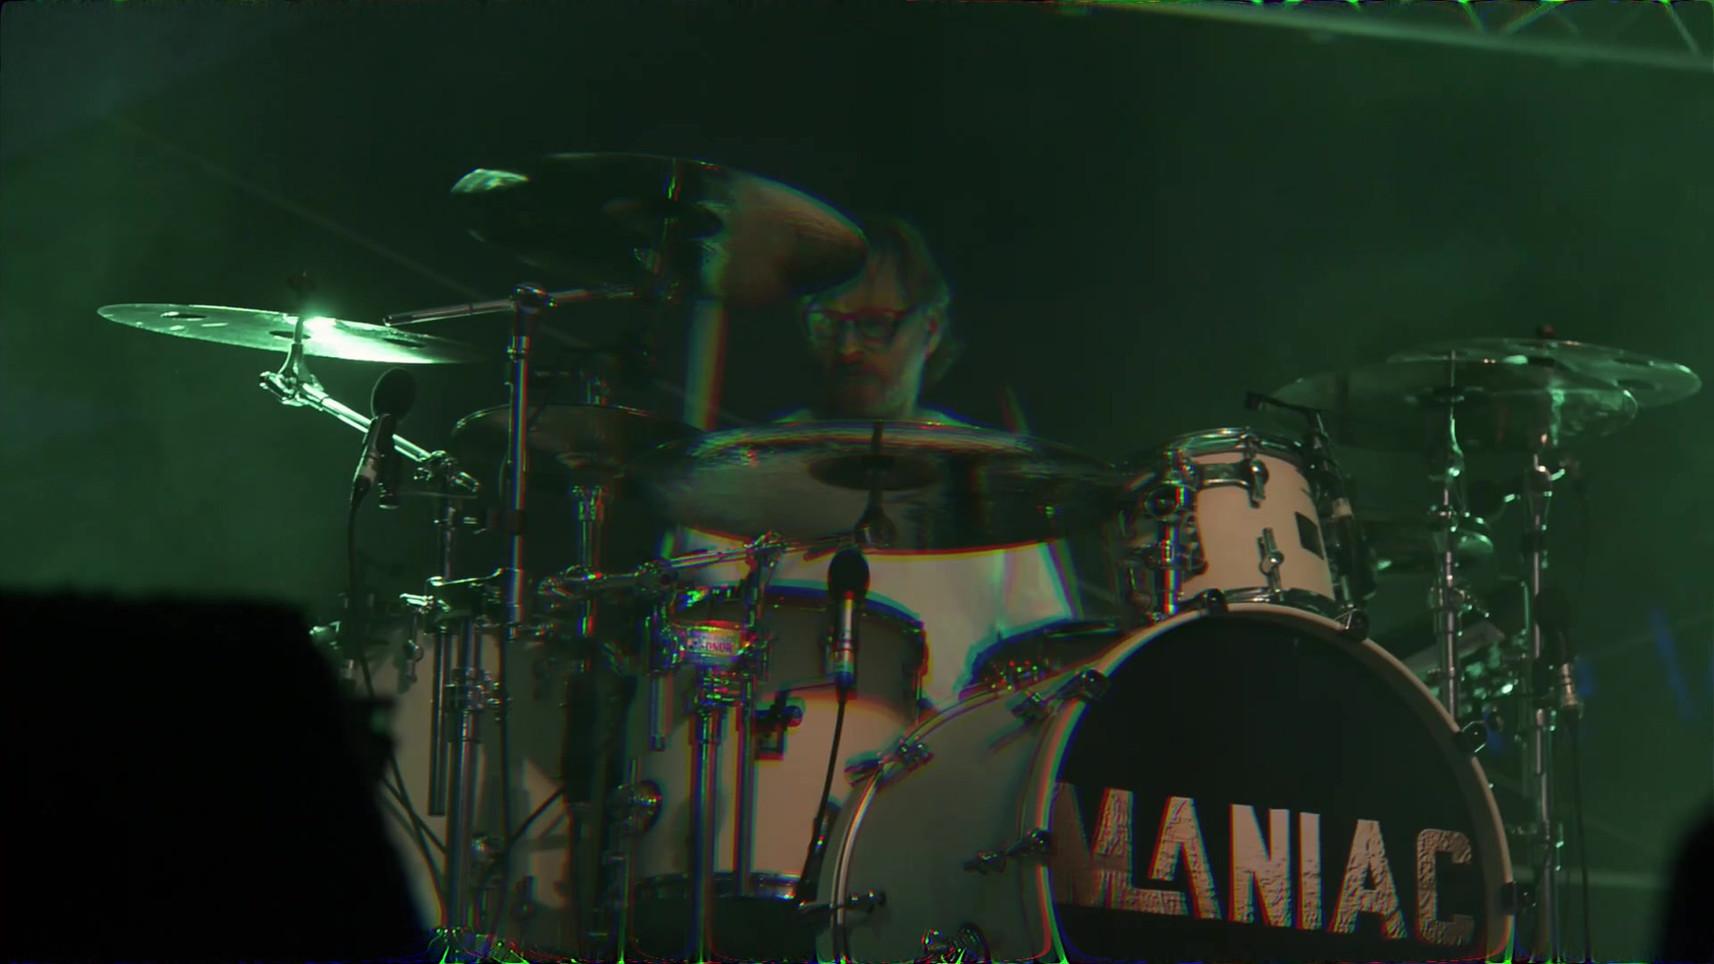 Live_in_Bad_Driburg_Maniac_2.mp4